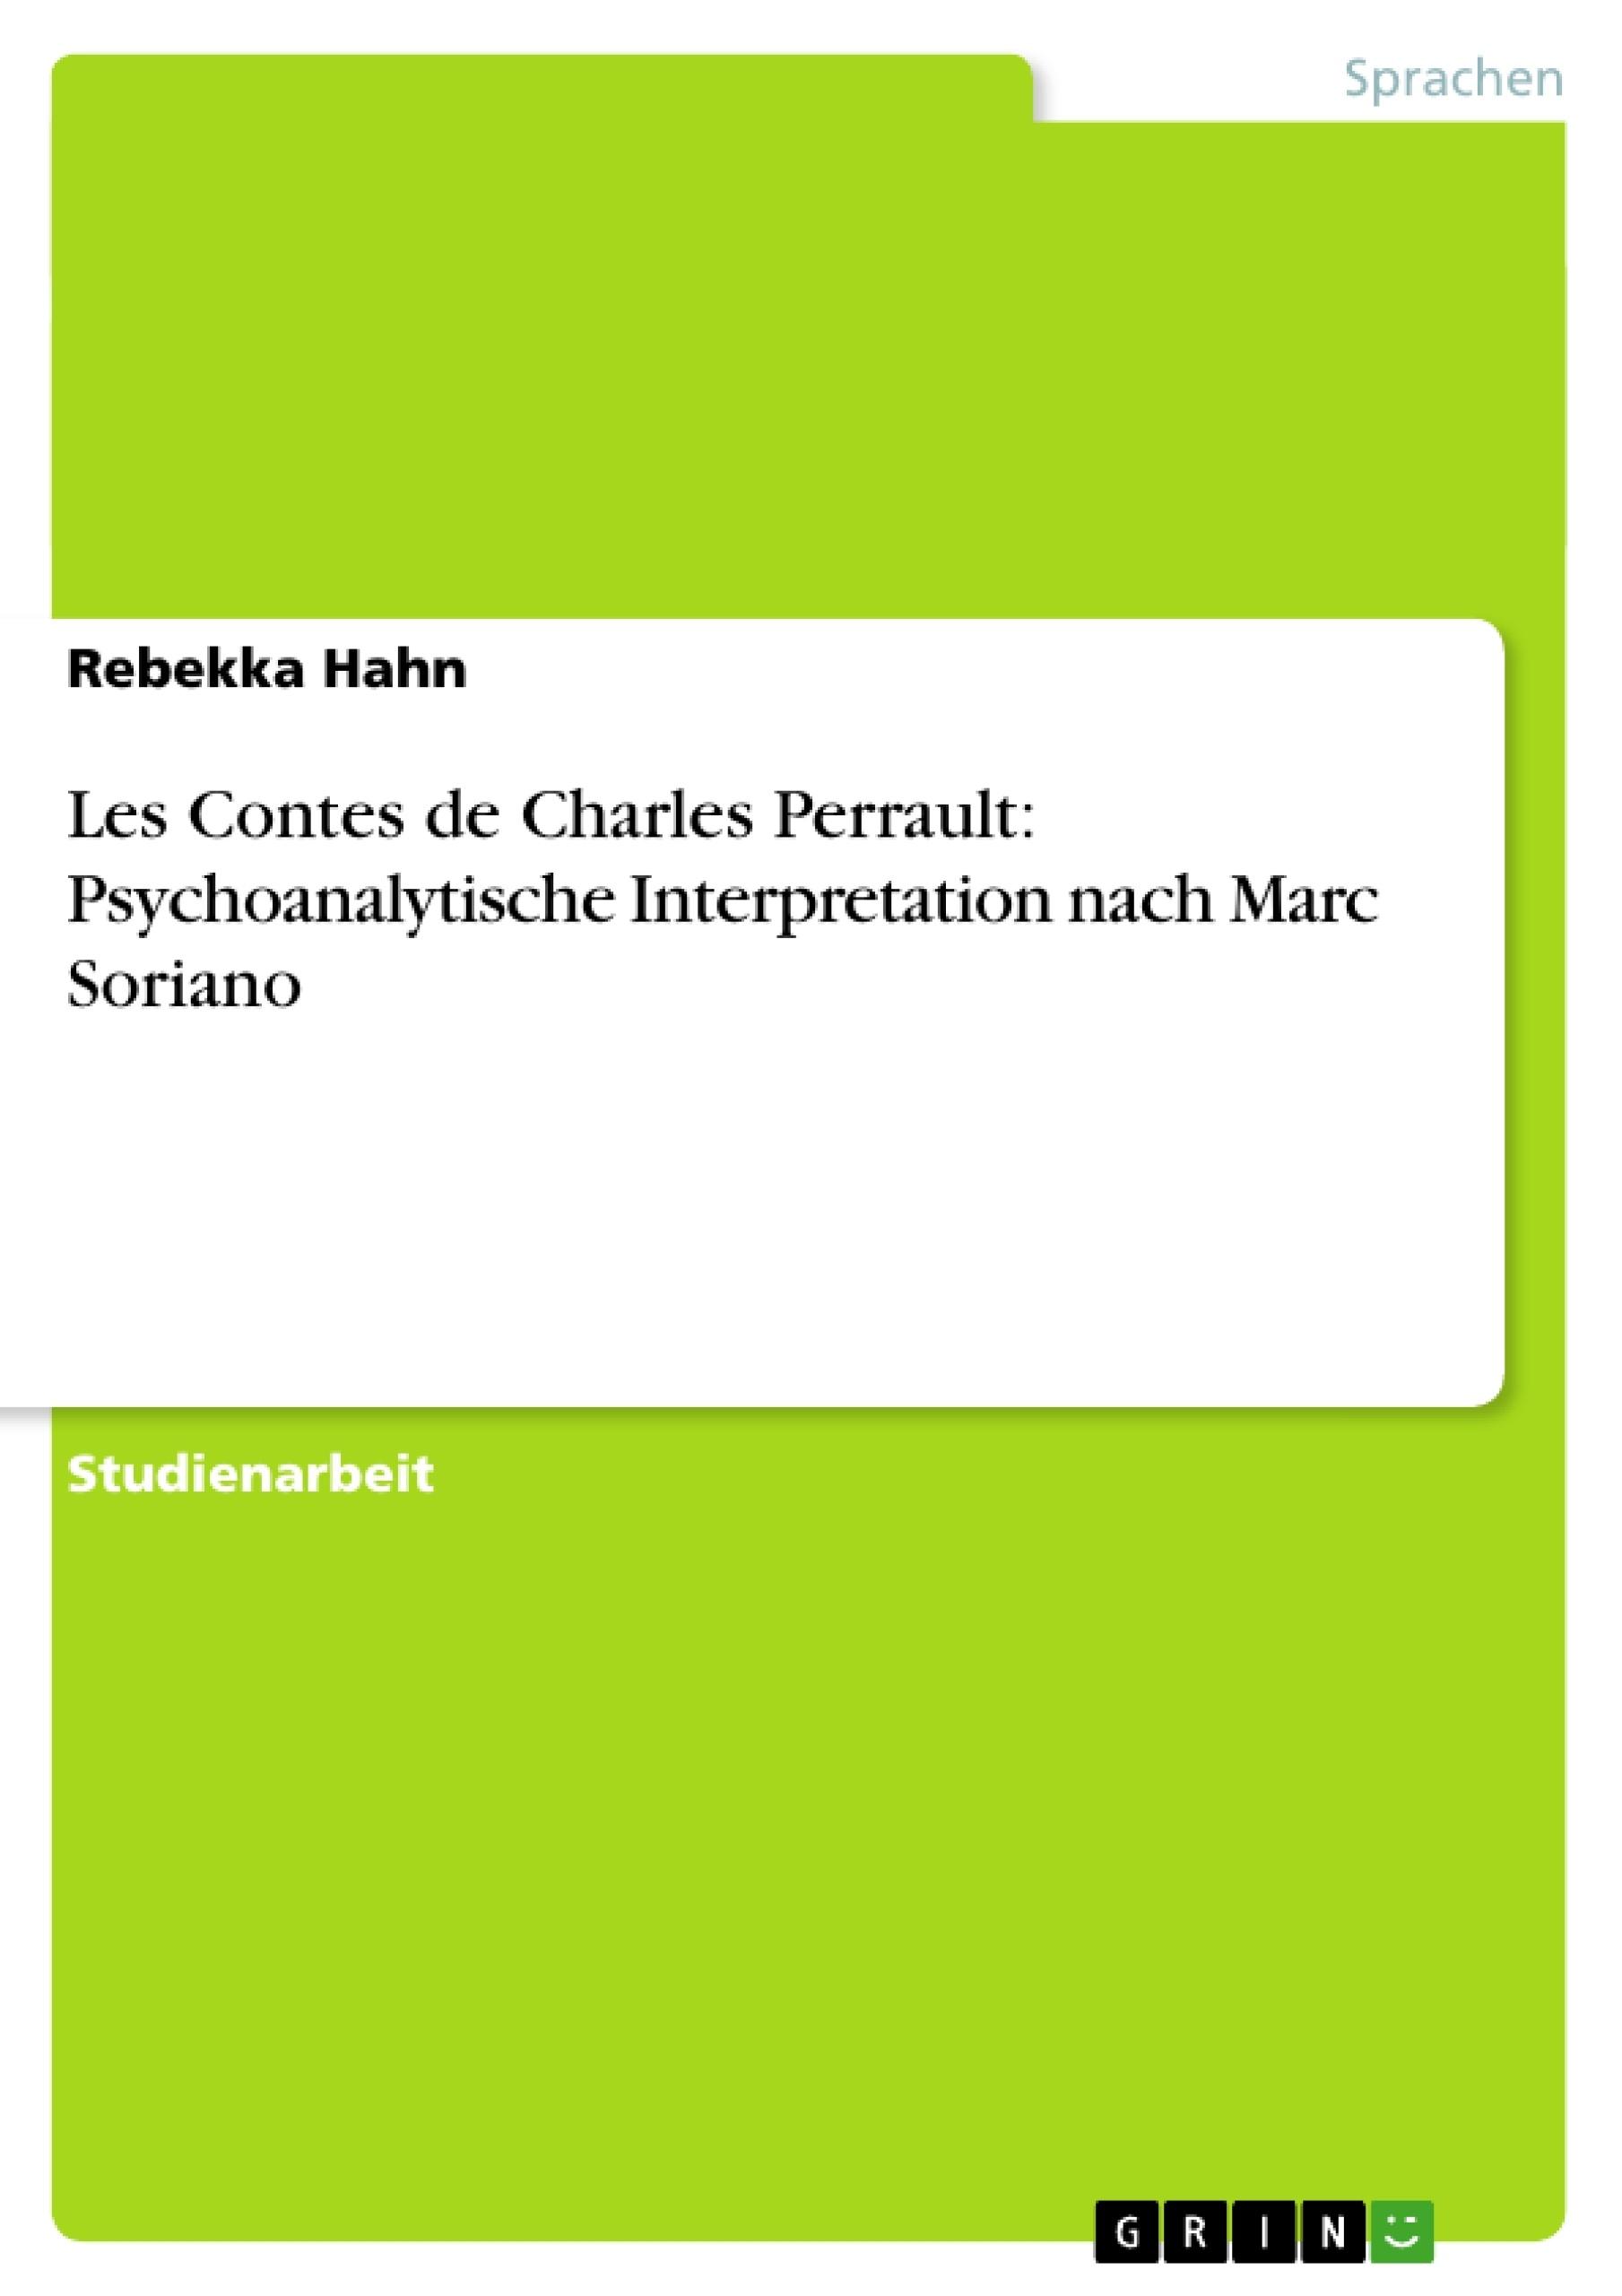 Titel: Les Contes de Charles Perrault: Psychoanalytische Interpretation nach Marc Soriano